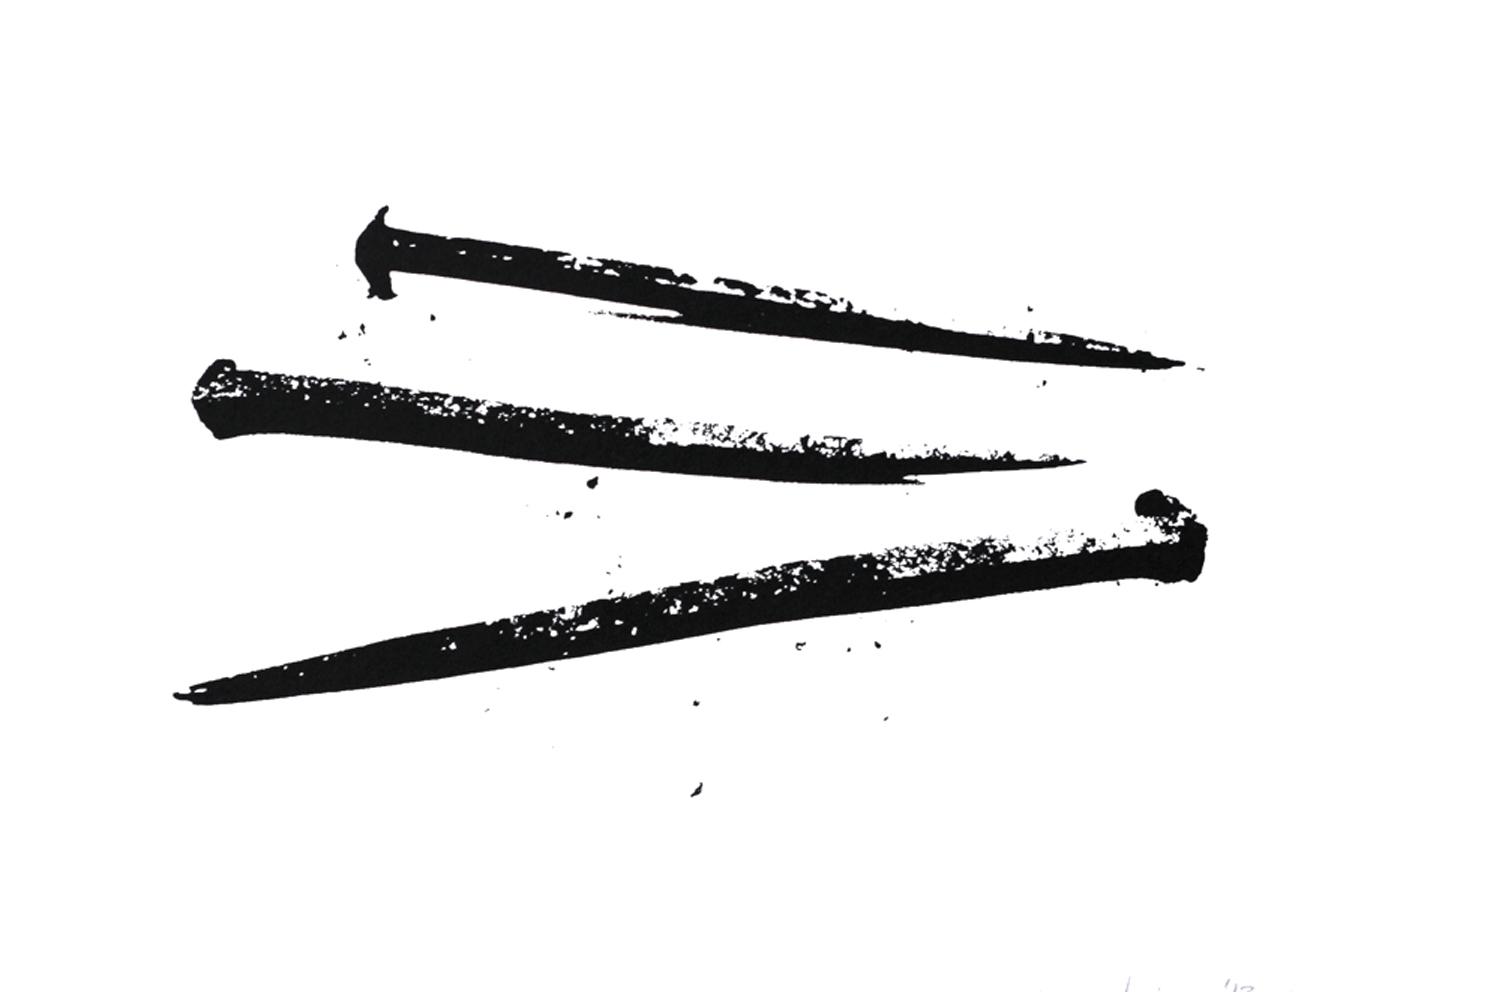 Untitled_Nails_Edition of 3_48x60cm_lg_Crop.jpg